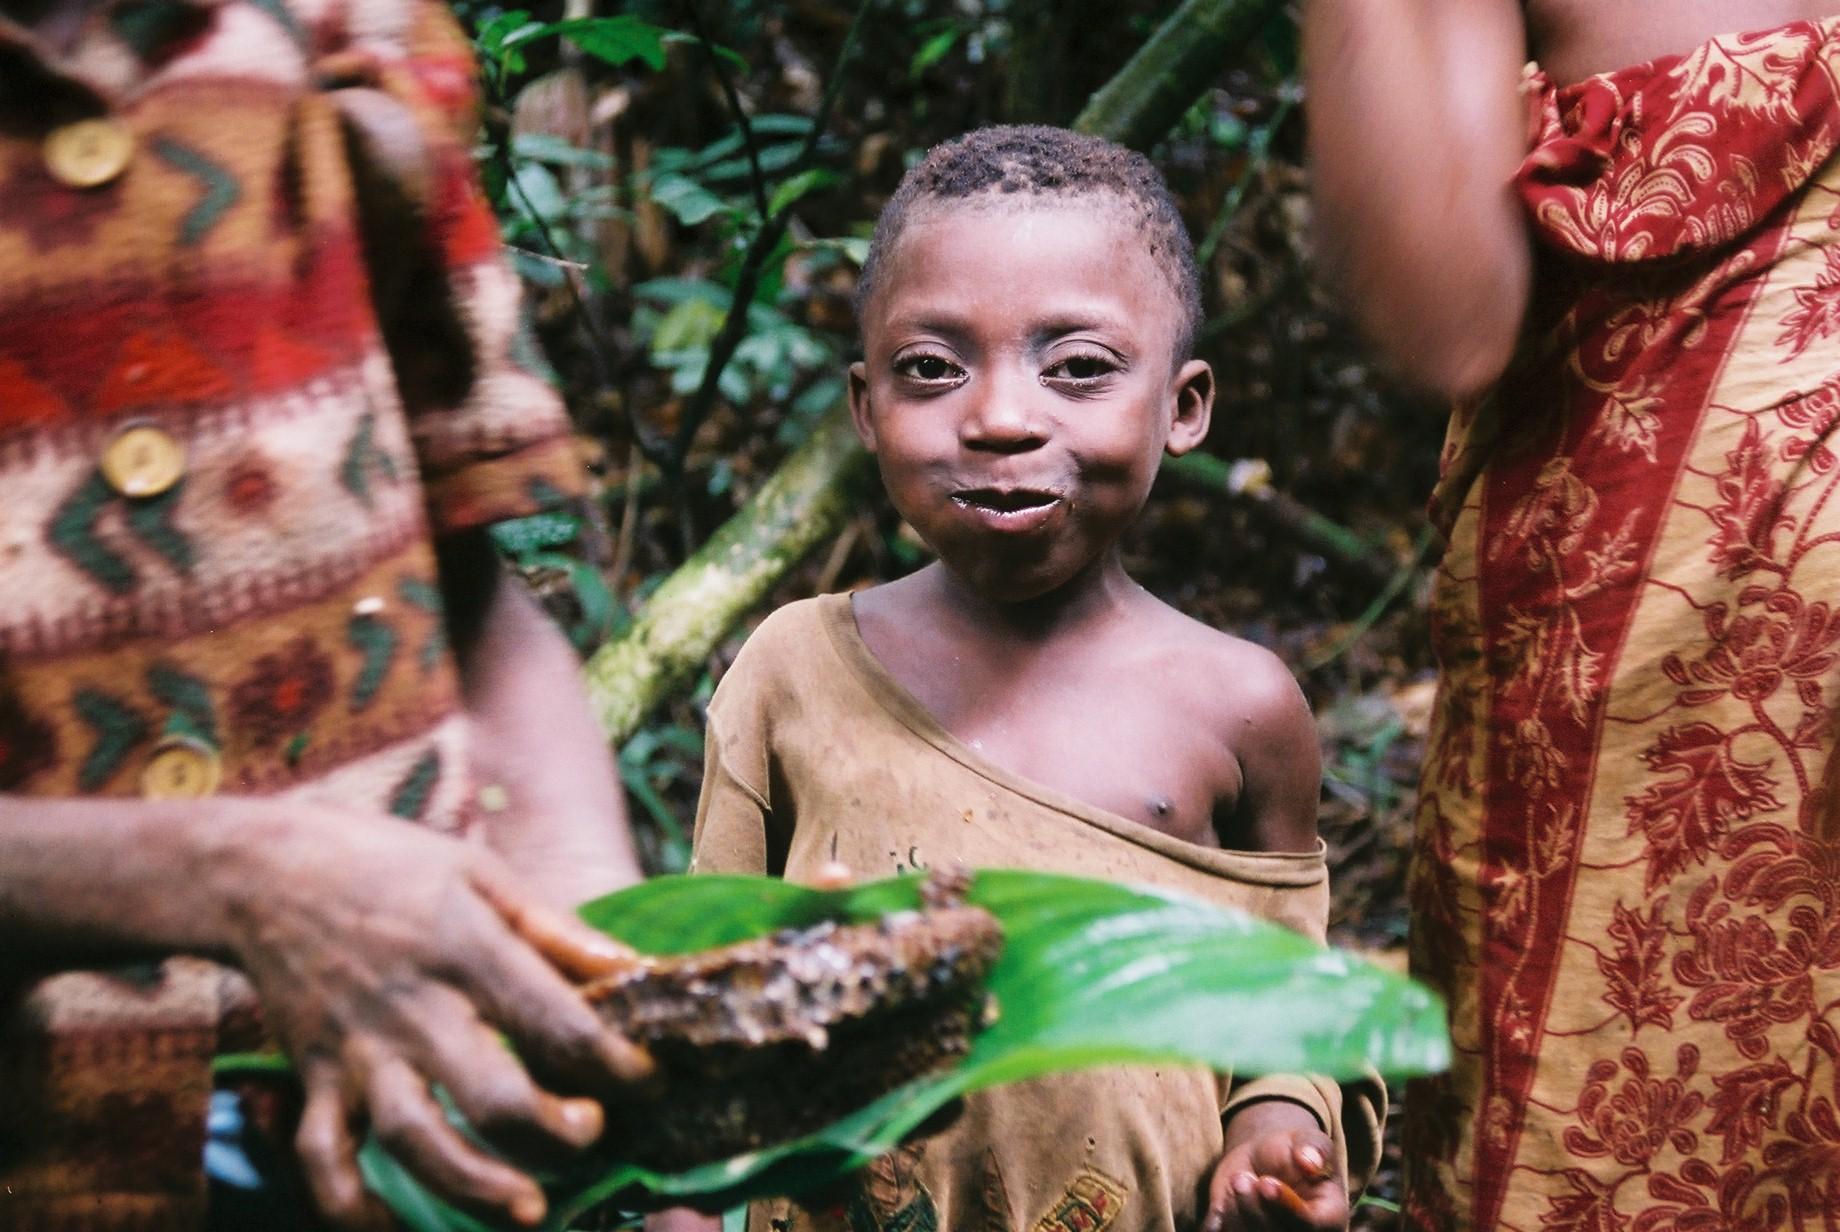 http://jambo.africa.kyoto-u.ac.jp/cgi-bin/CameroonFS/wiki.cgi?action=ATTACH&page=%BB%CD%CA%FD%E4%C0&file=shikata3%2Ejpg